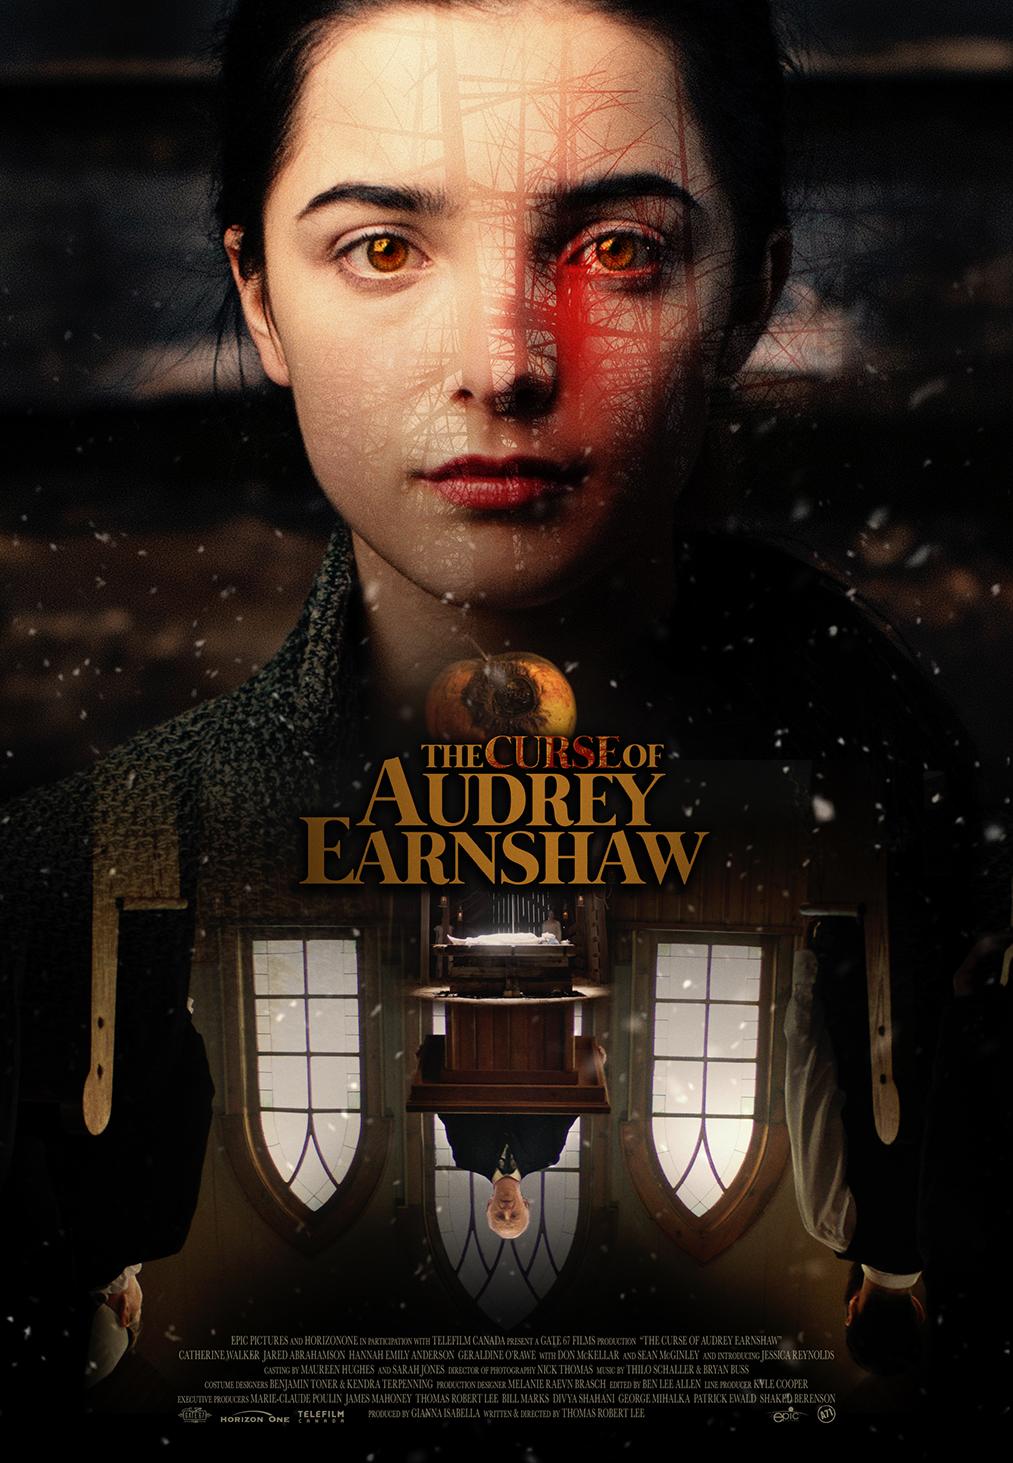 The Curse of Audrey Earnshaw kapak